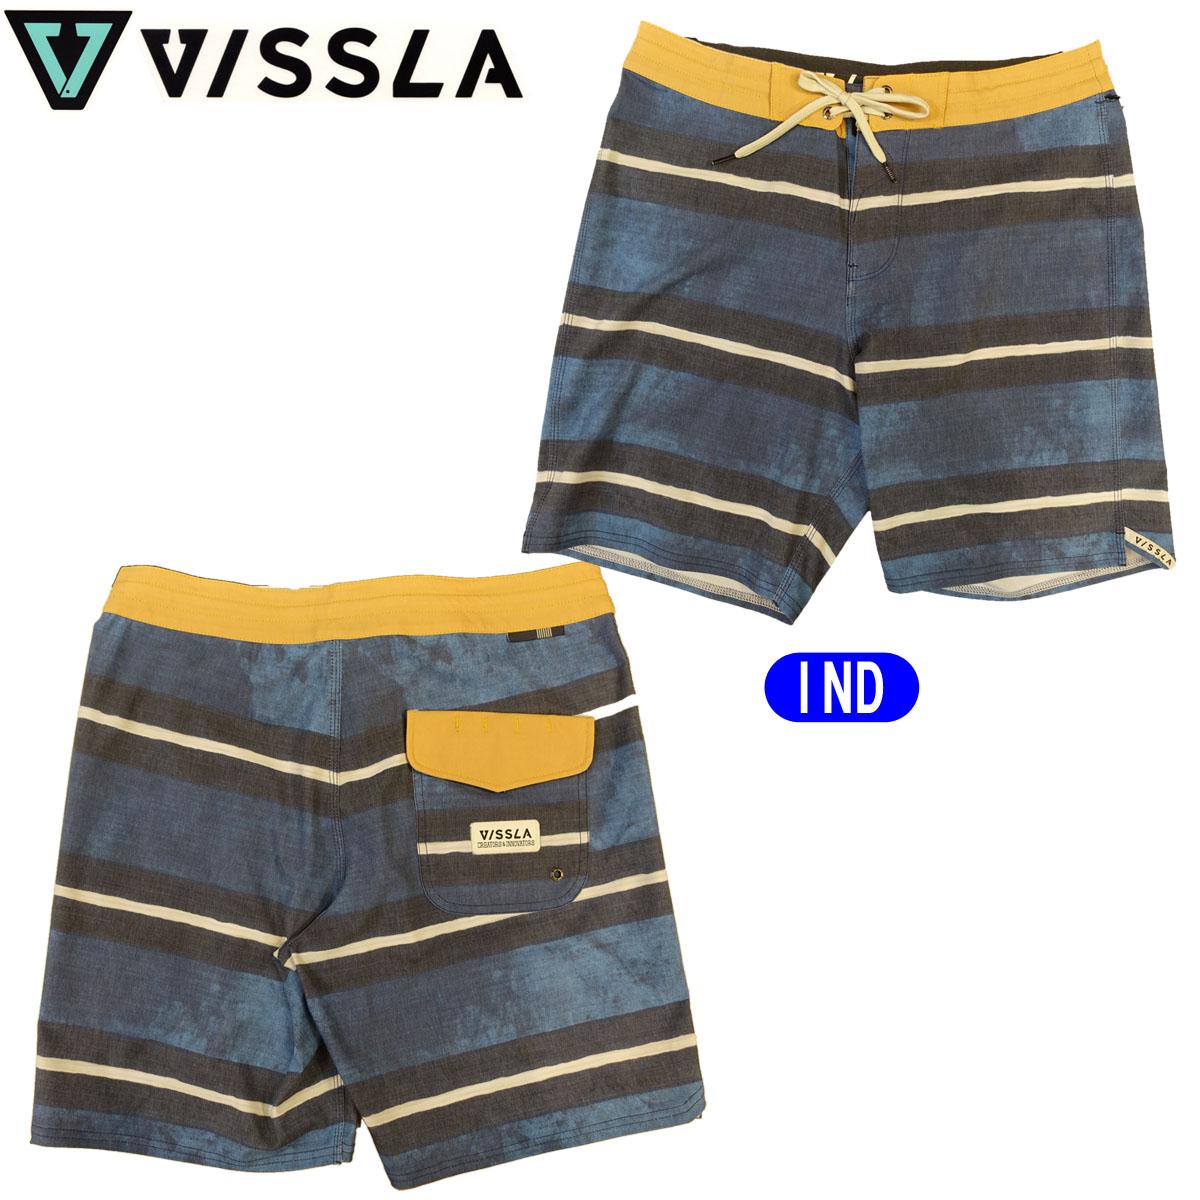 【VISSLA(ヴィスラ)】ボードショーツ 海パン 水着 品番:M1044VIC 即日出荷 日本正規品 メール便(送料無料)